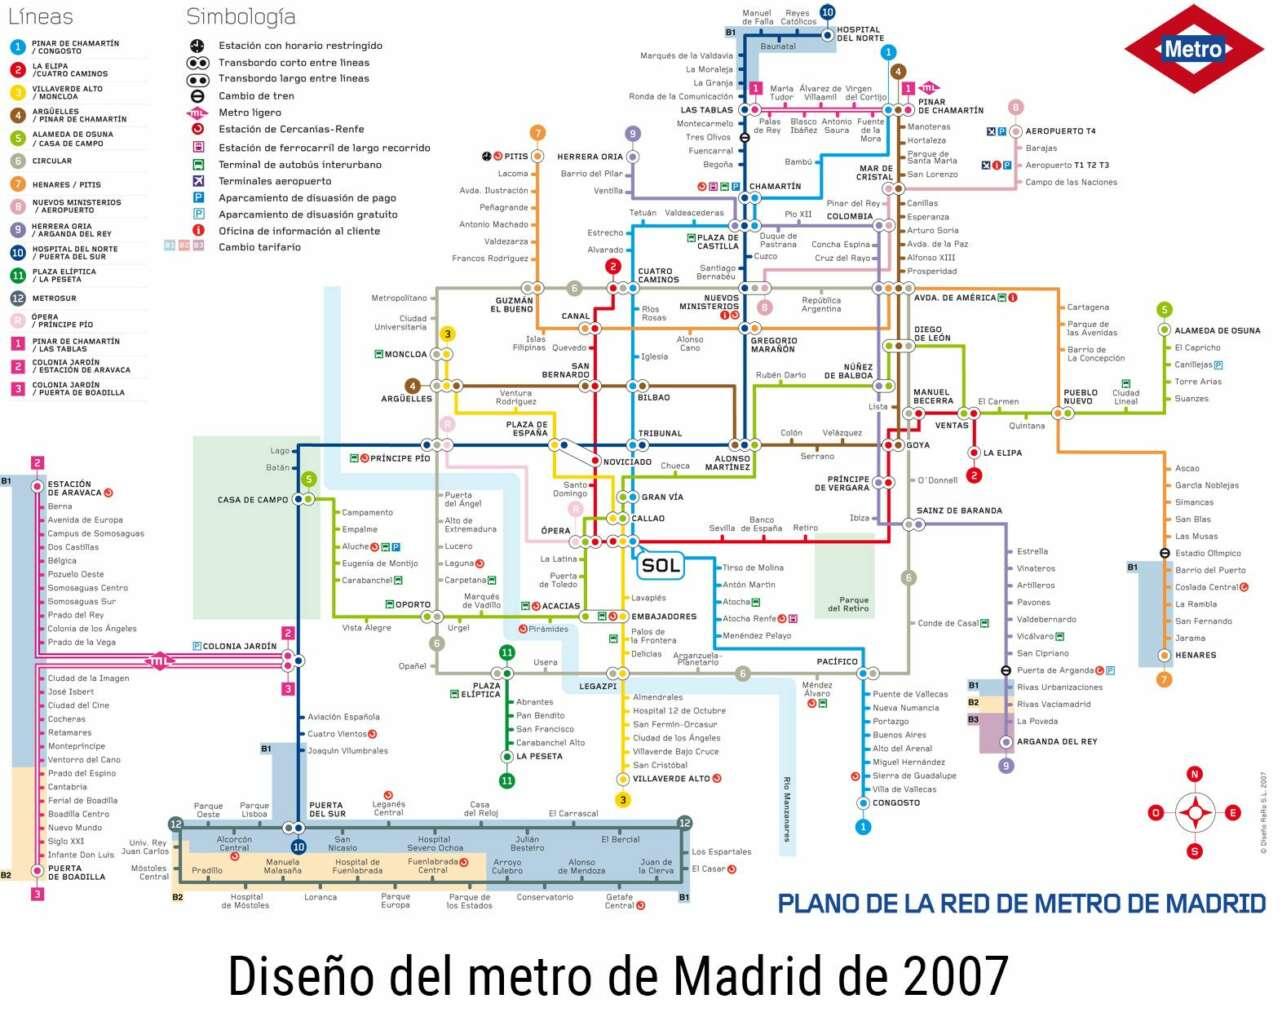 Madrid plano metro 2007